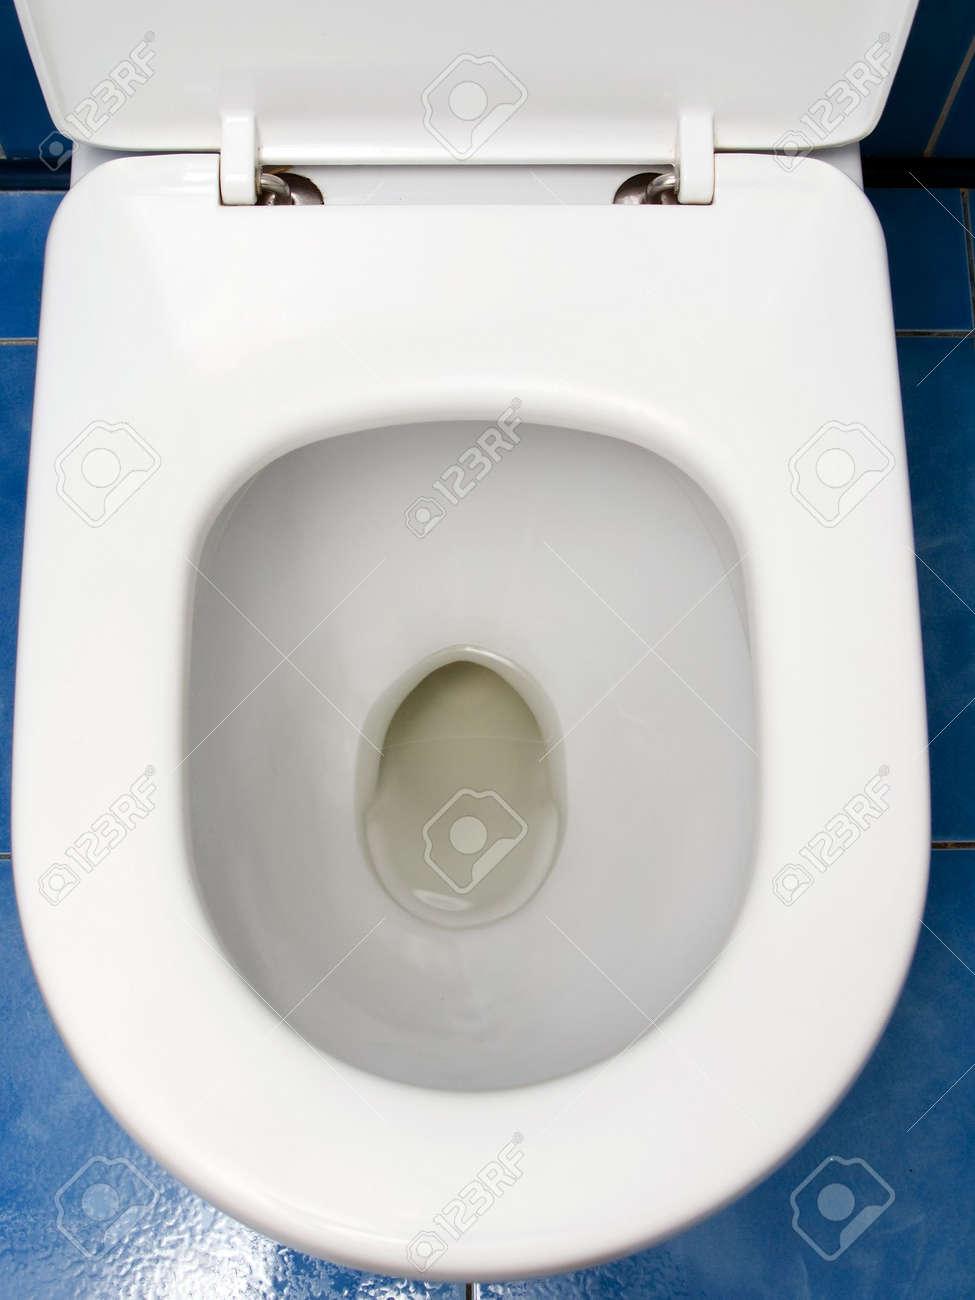 Home interior clean toilet sink bowl on tile floor Stock Photo - 5638827